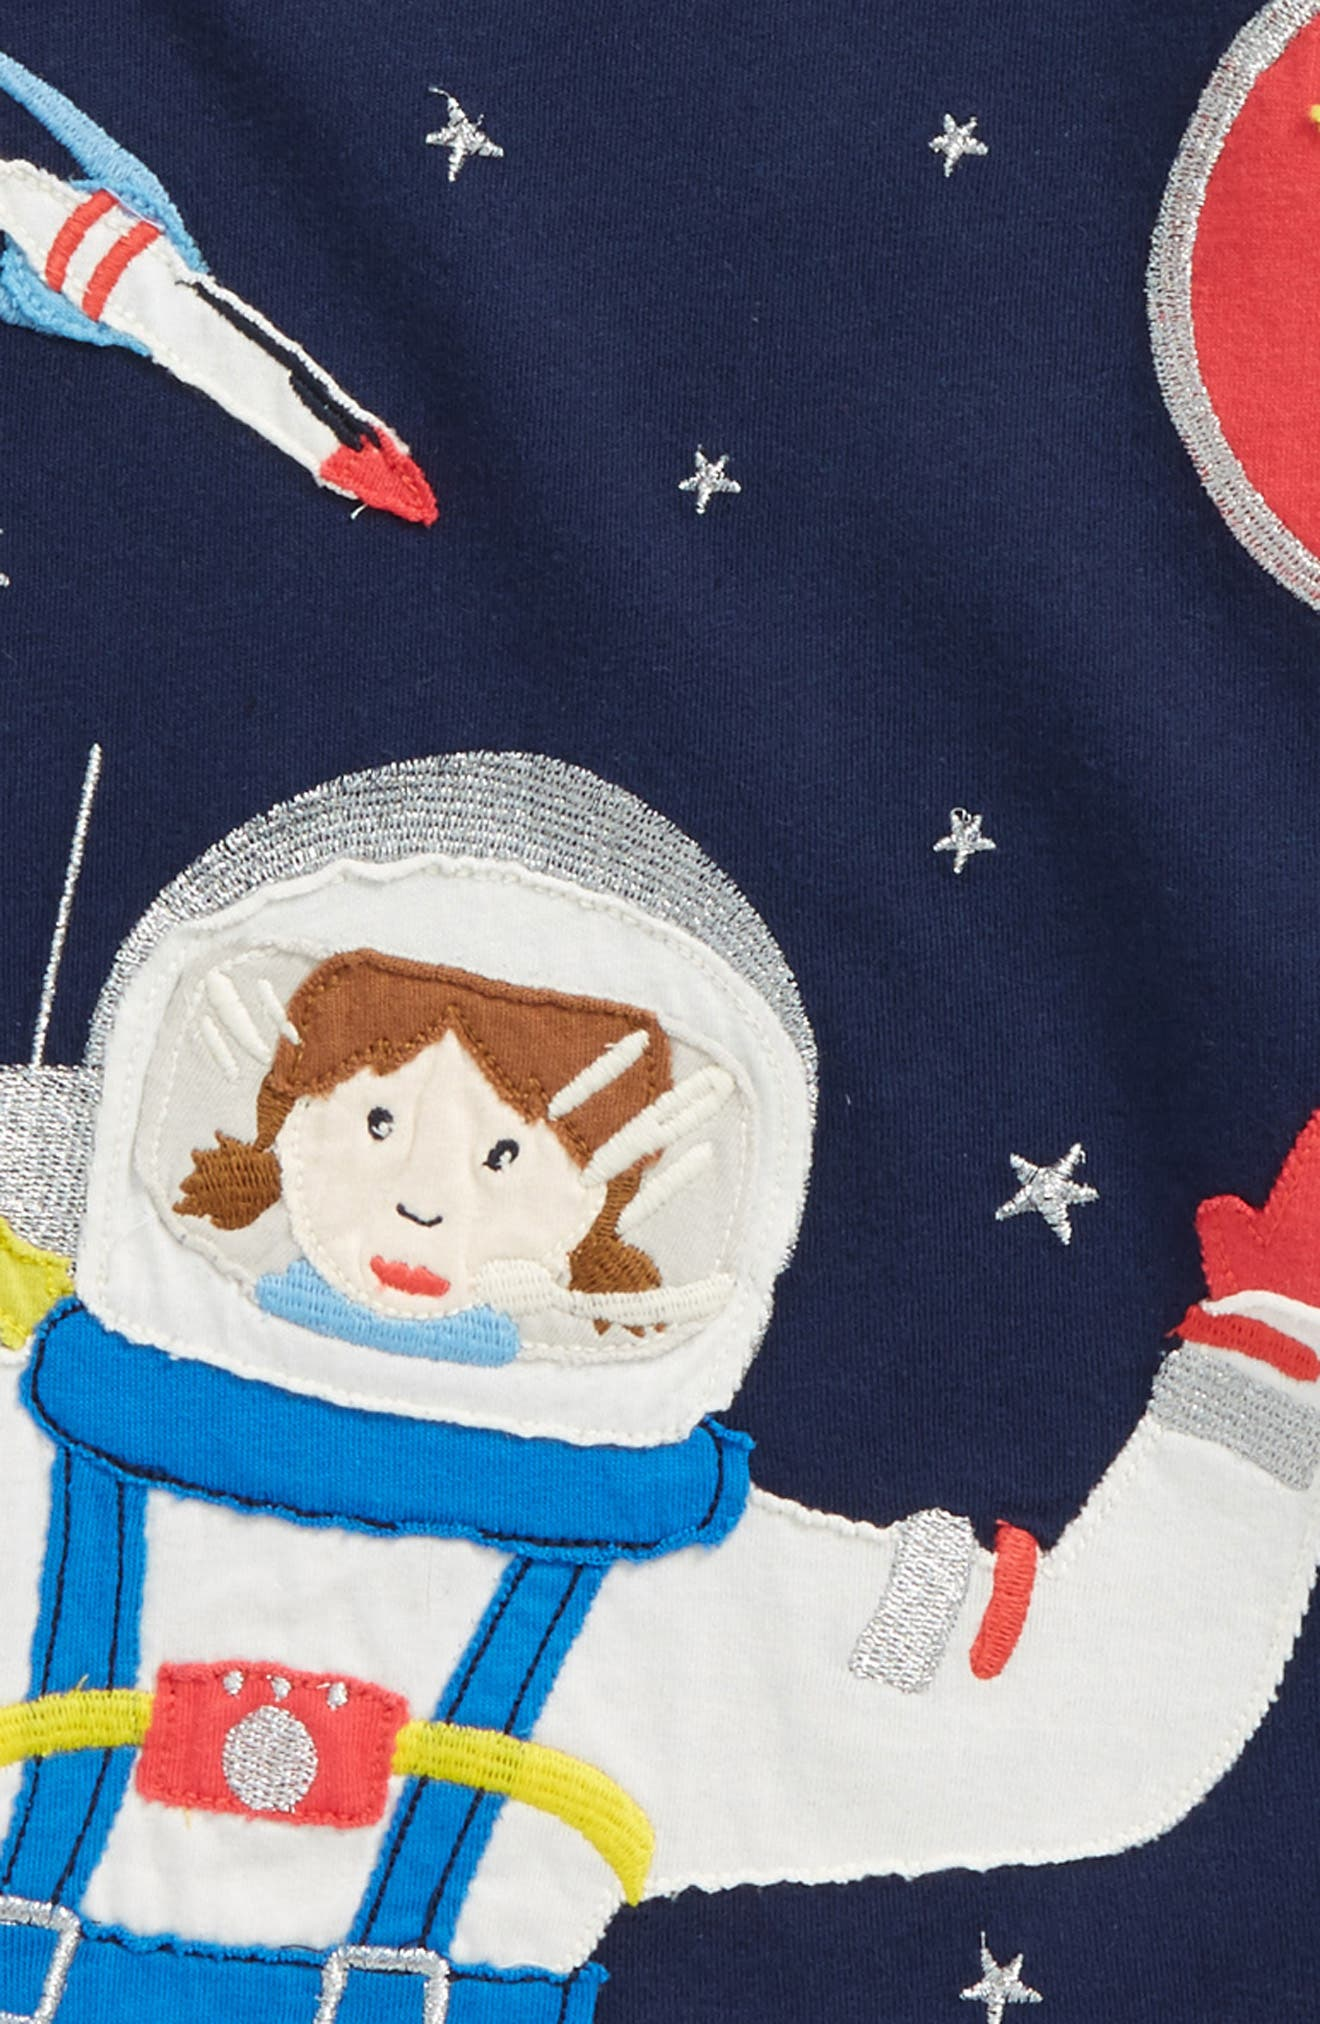 Space Girl Appliqué Tee,                             Alternate thumbnail 2, color,                             School Navy